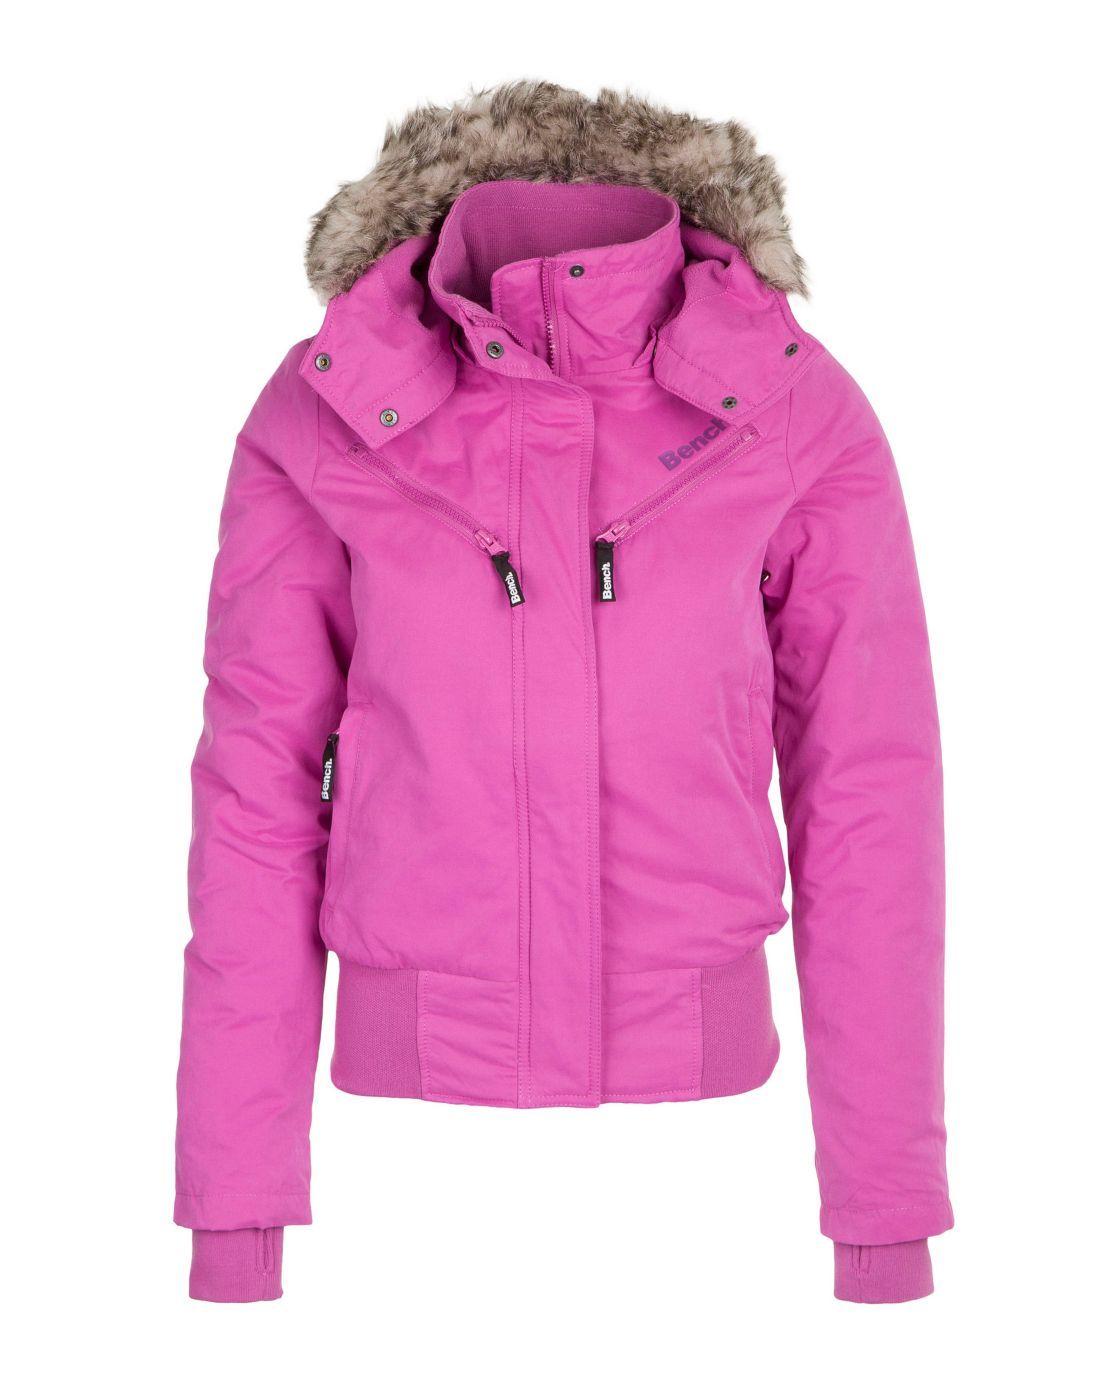 Pink Bench Jacket Bench Jackets Jackets Coat Pant [ 1400 x 1100 Pixel ]